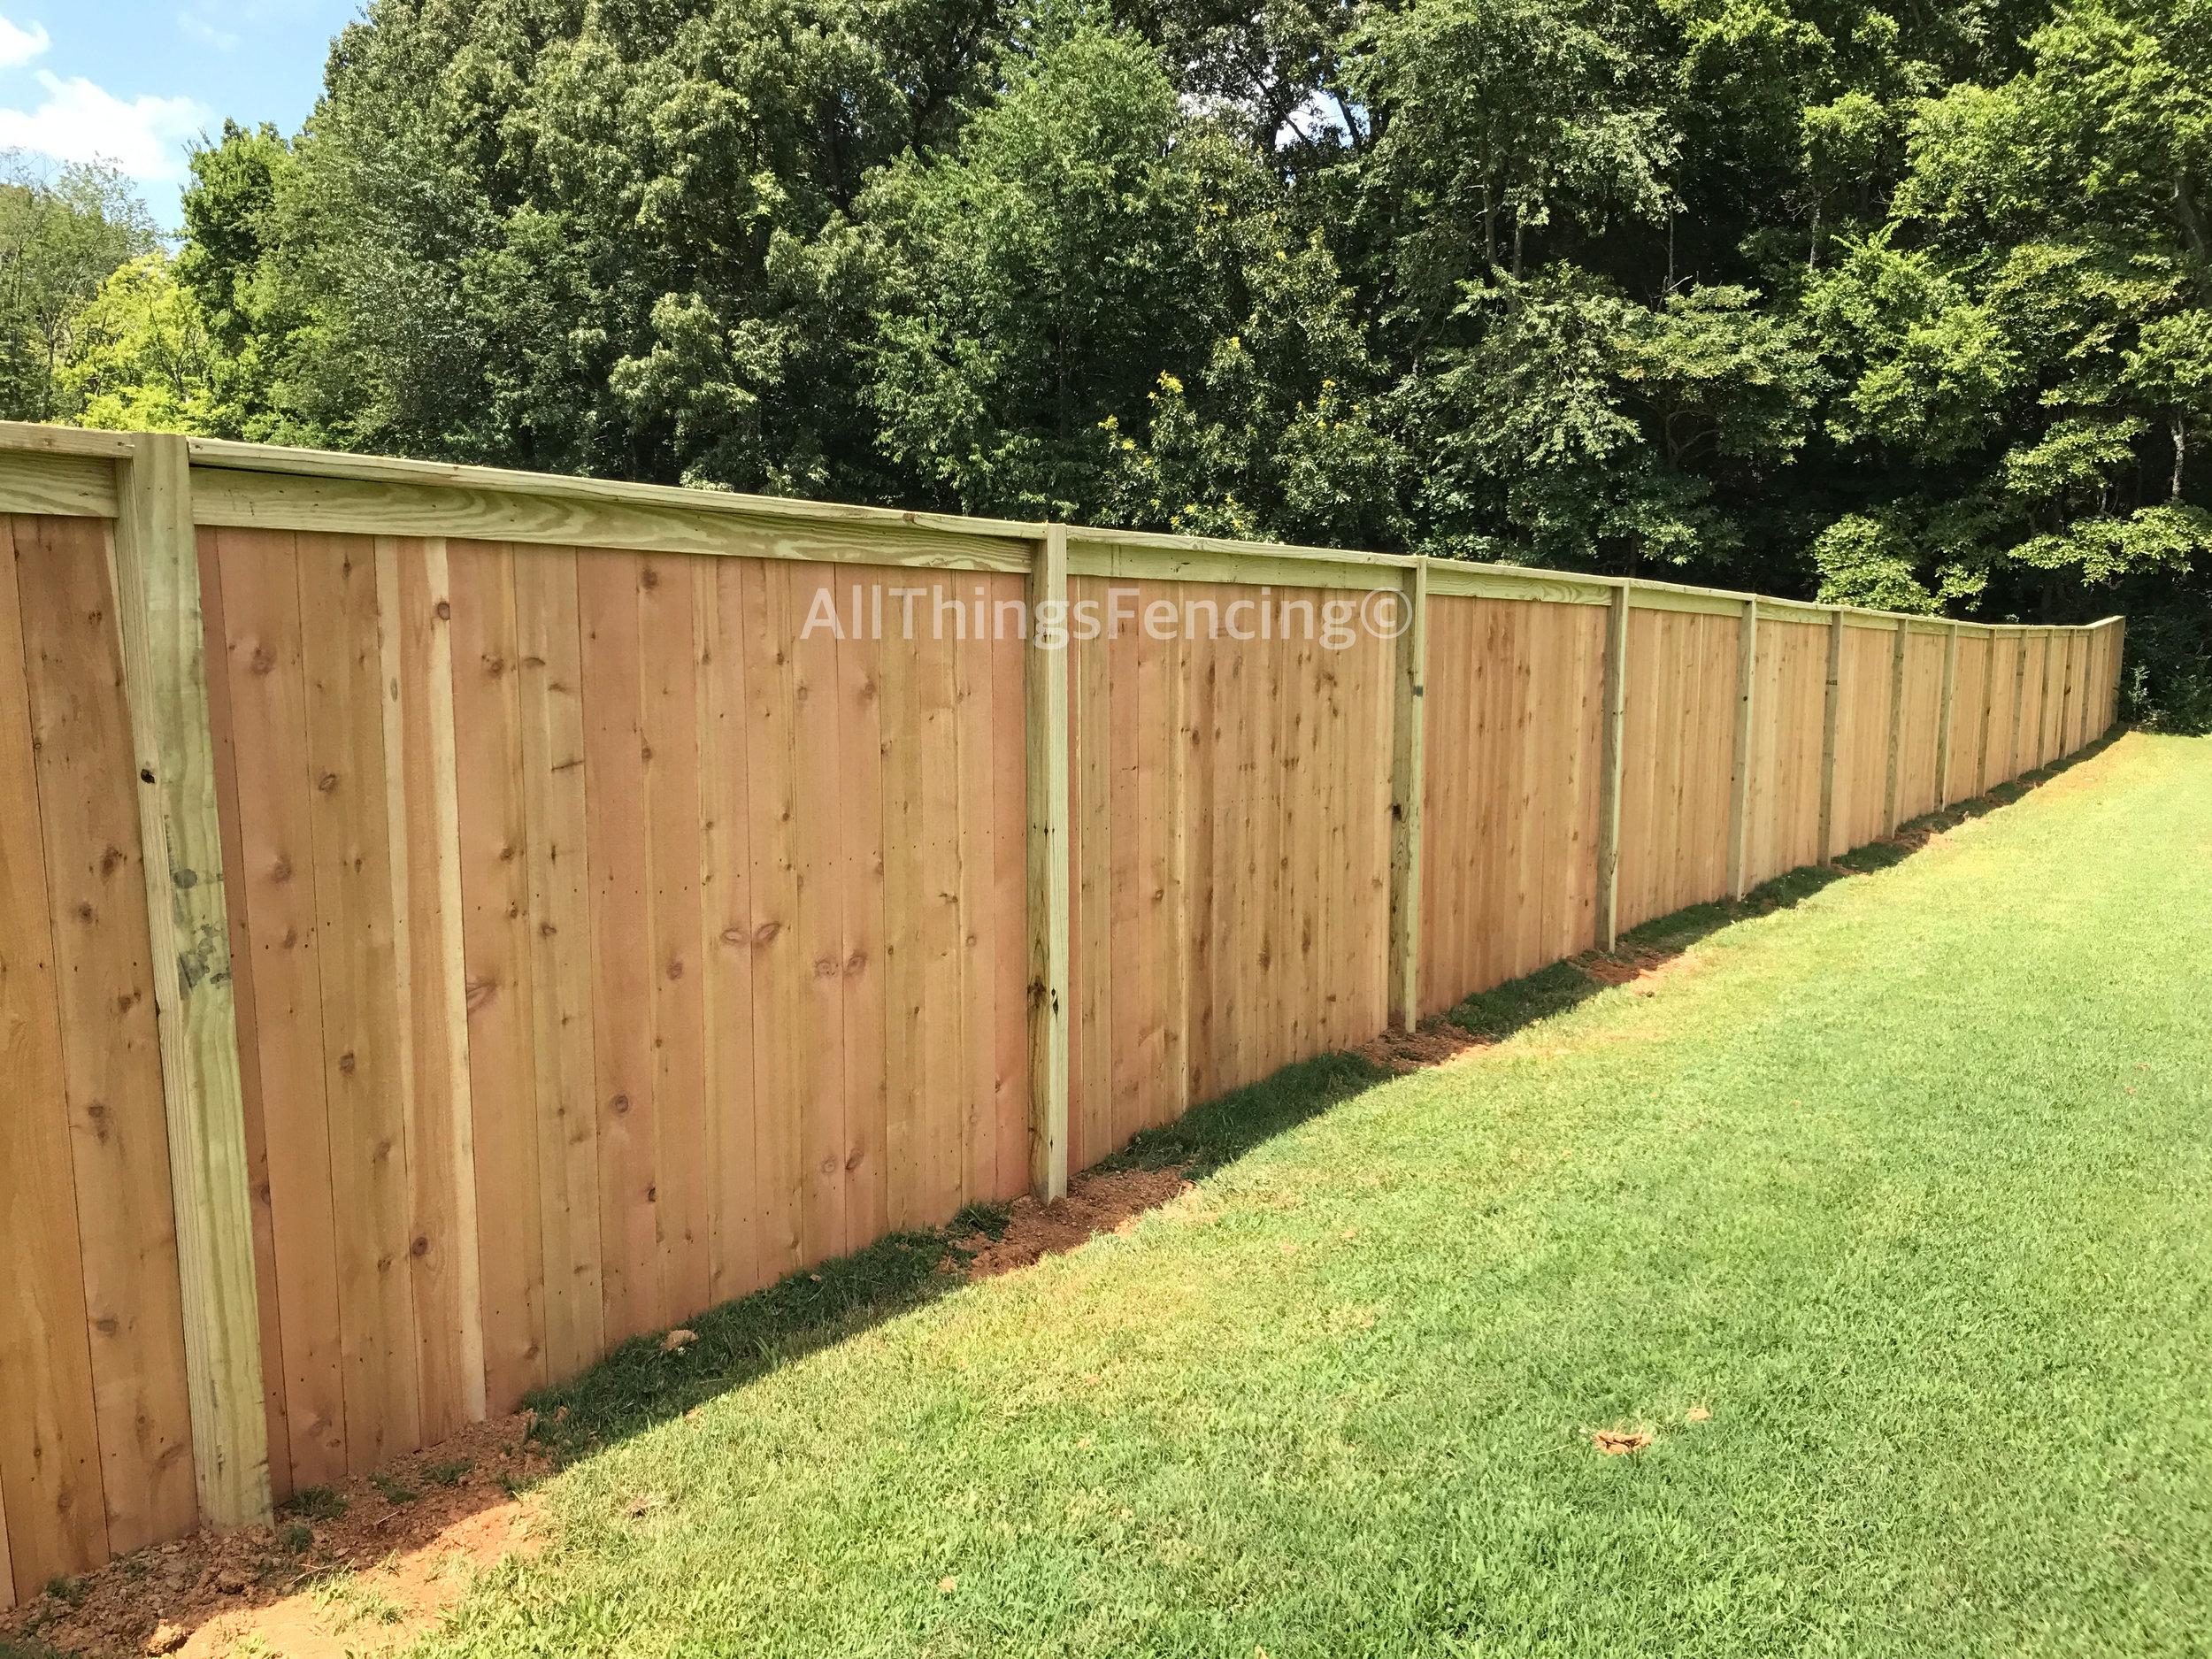 Fence31.jpg